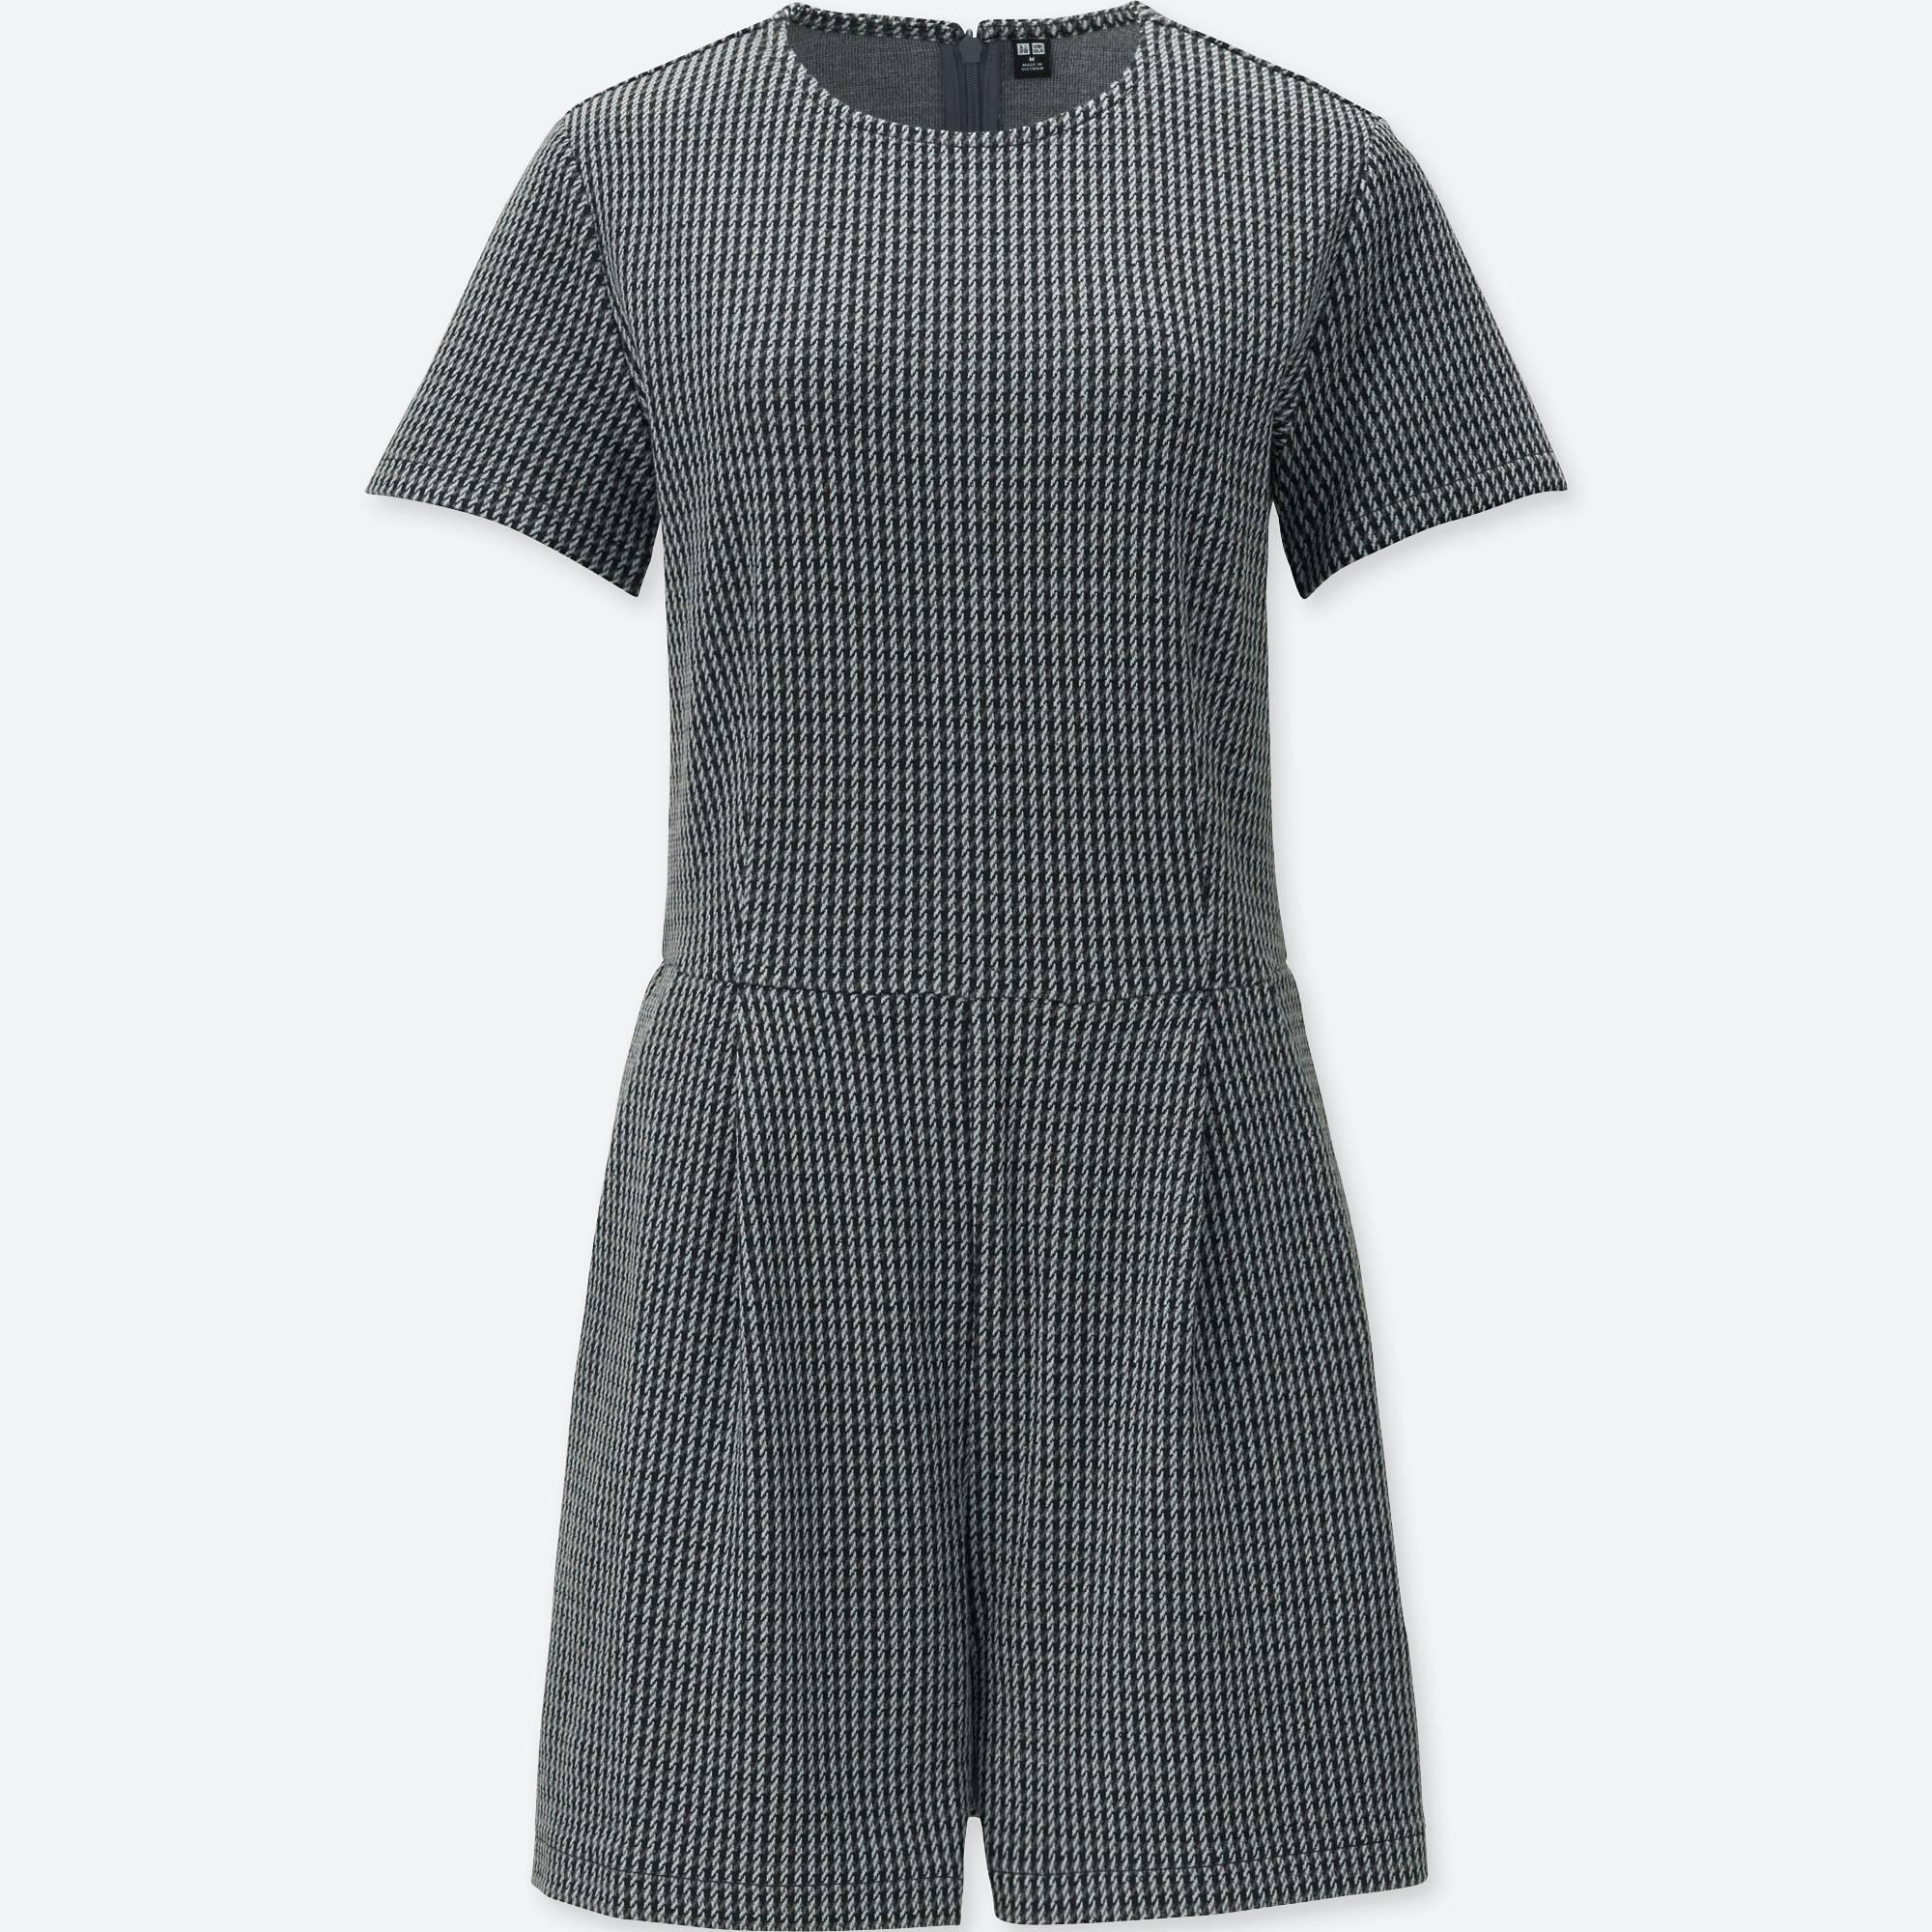 UNIQLO / Váy đầm & Jumpsuits women jacquard short-sleeve romper